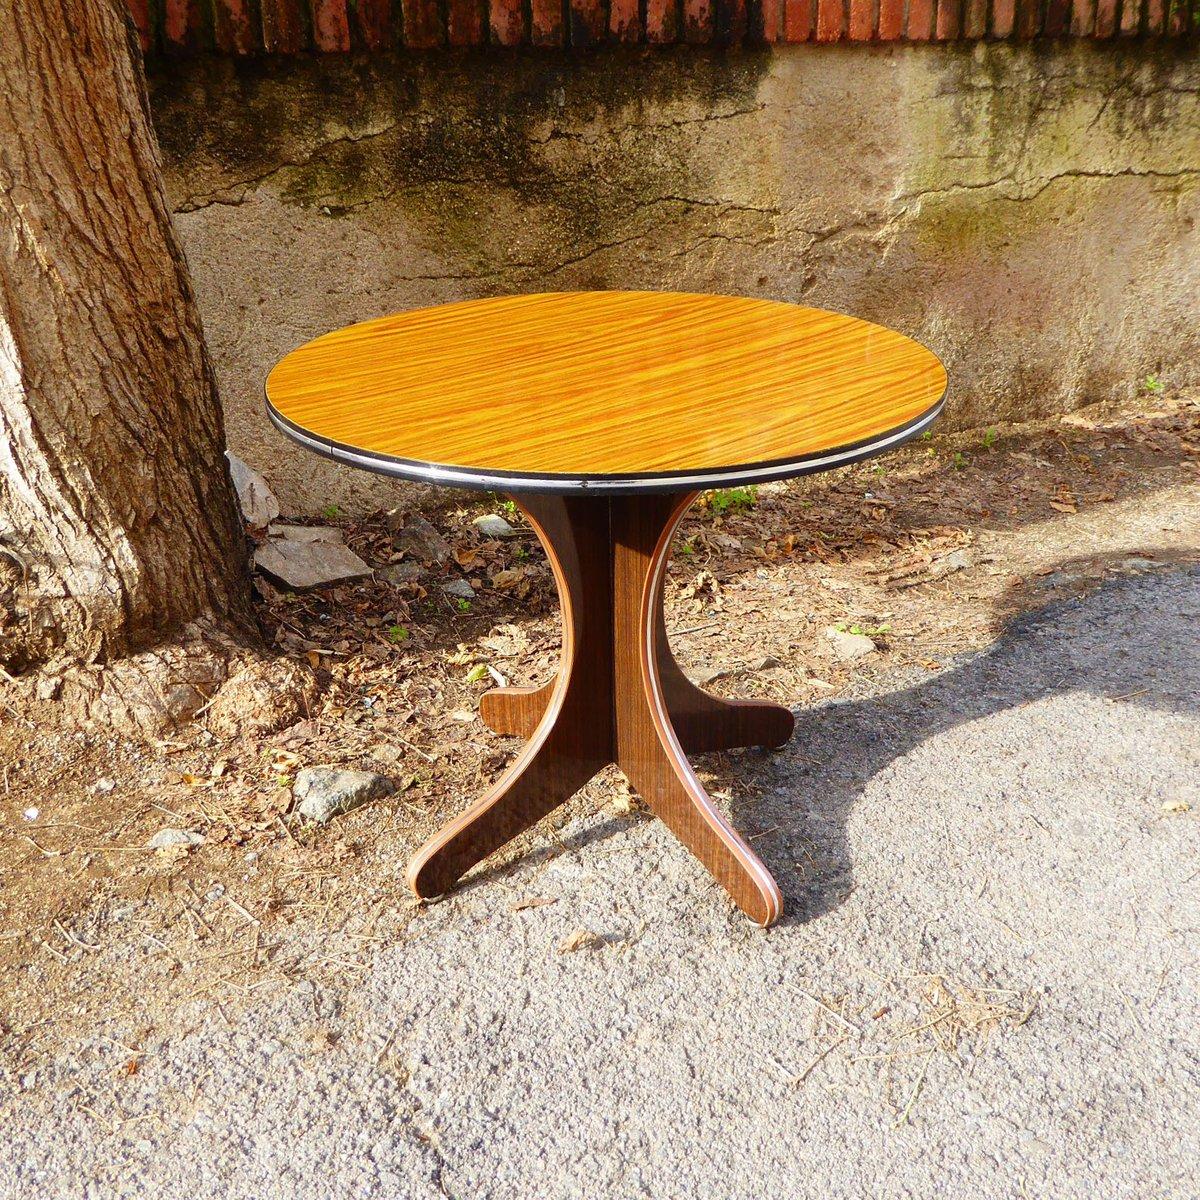 vintage round formica side table 1970s for sale at pamono. Black Bedroom Furniture Sets. Home Design Ideas